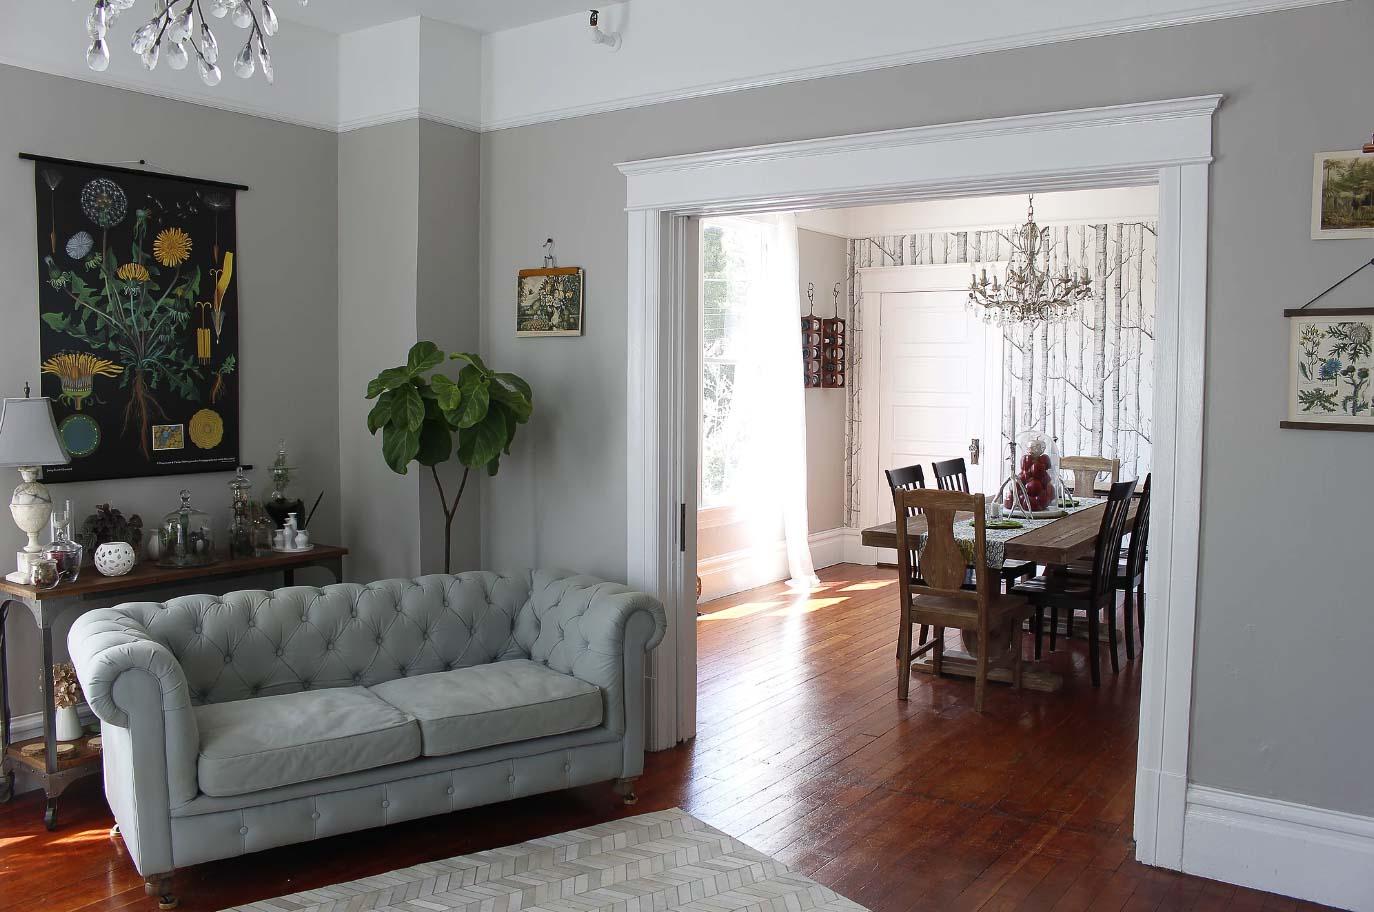 Petaluma-Place-natural-light-photography-studio-lifestyle-photo-ideas-indoor-photoshoot-location-5.jpg